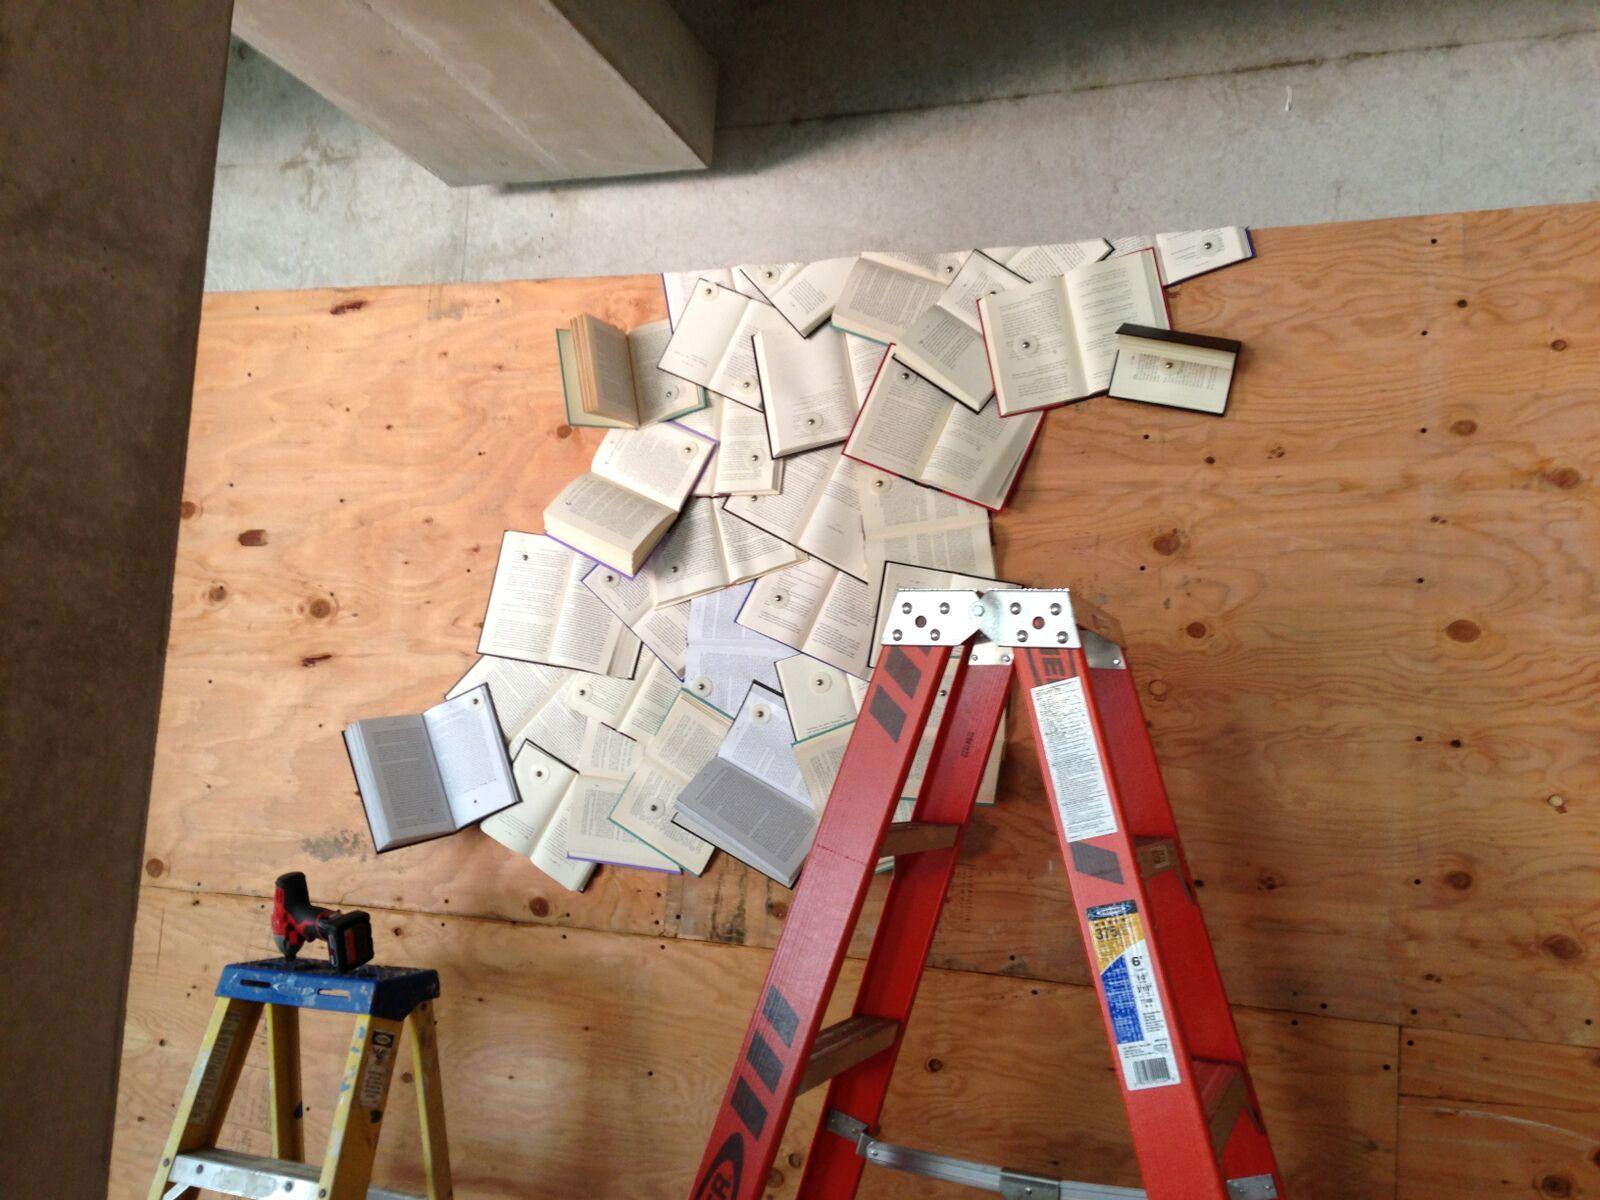 San Diego_Hiding My Candy _Donald Lipski_Public Art Services_J Grant Projects_8.jpeg